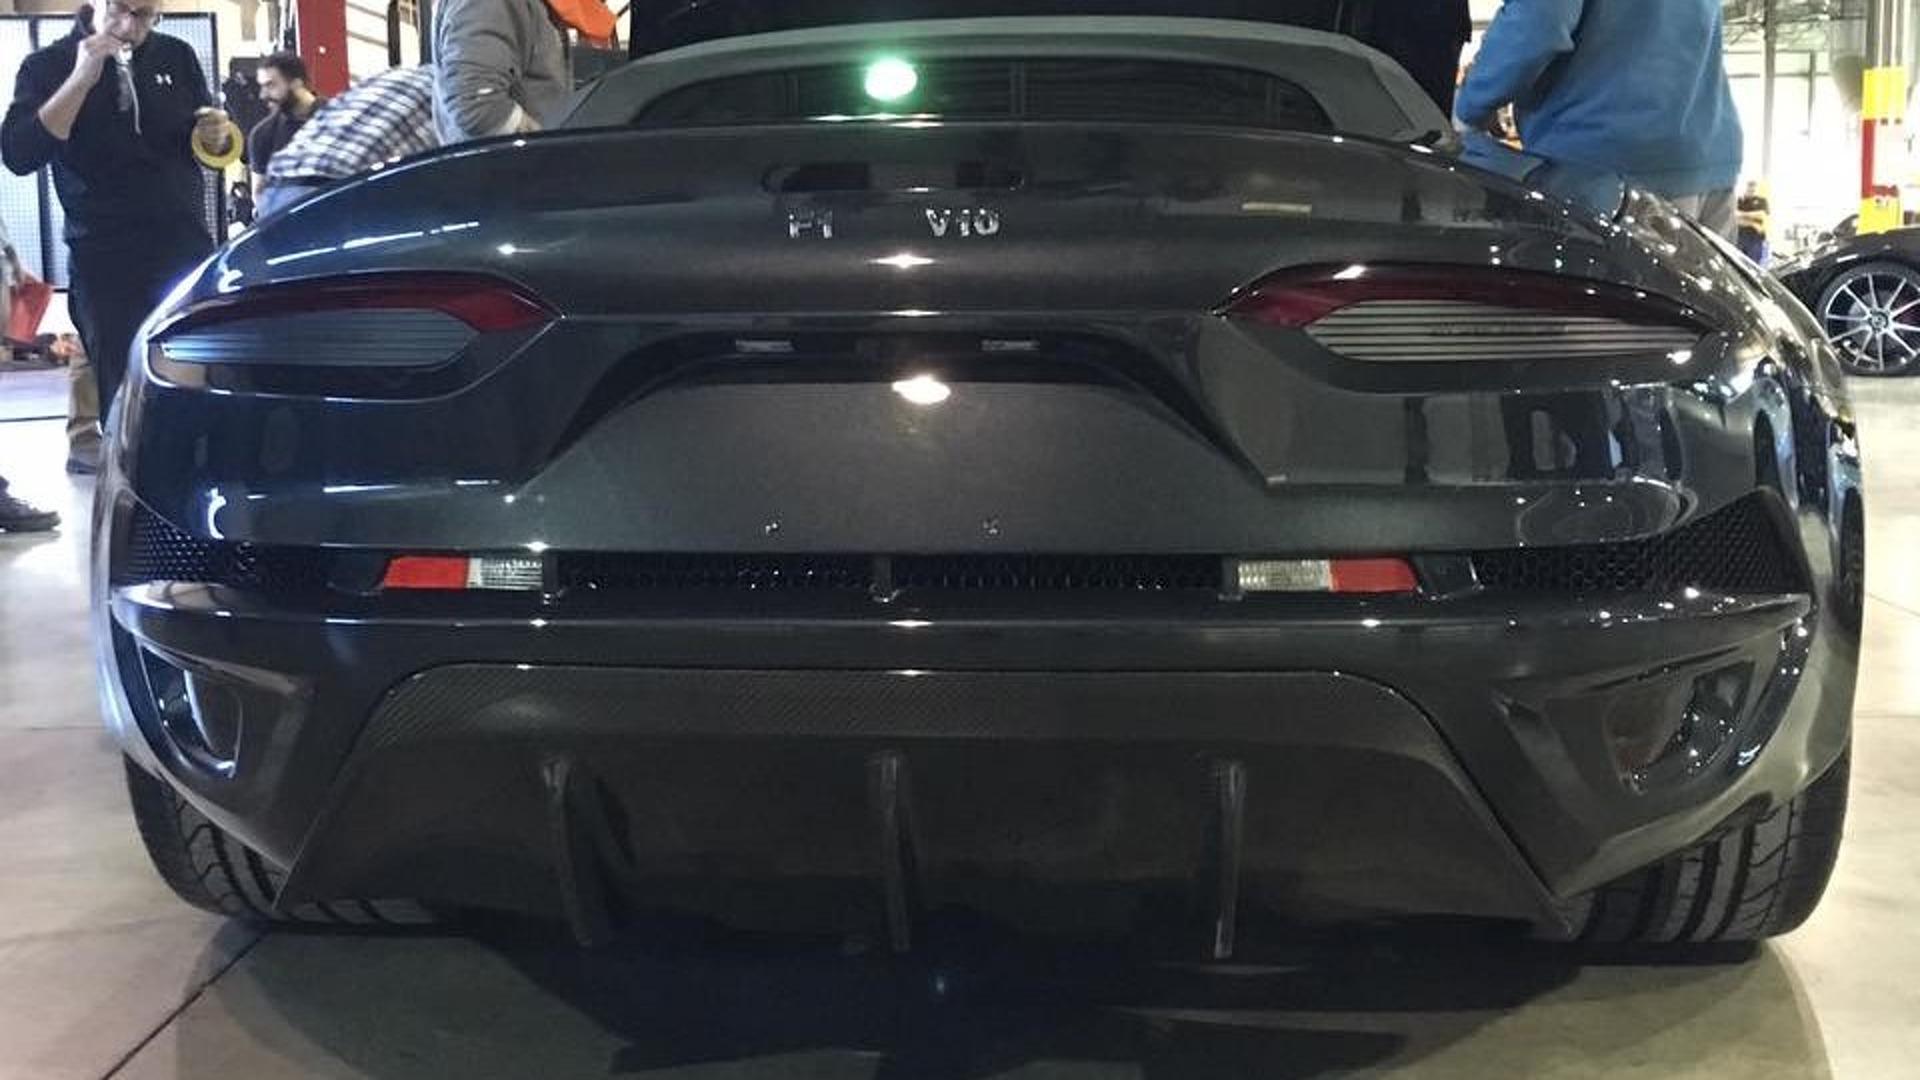 vlf-force-1-roadster